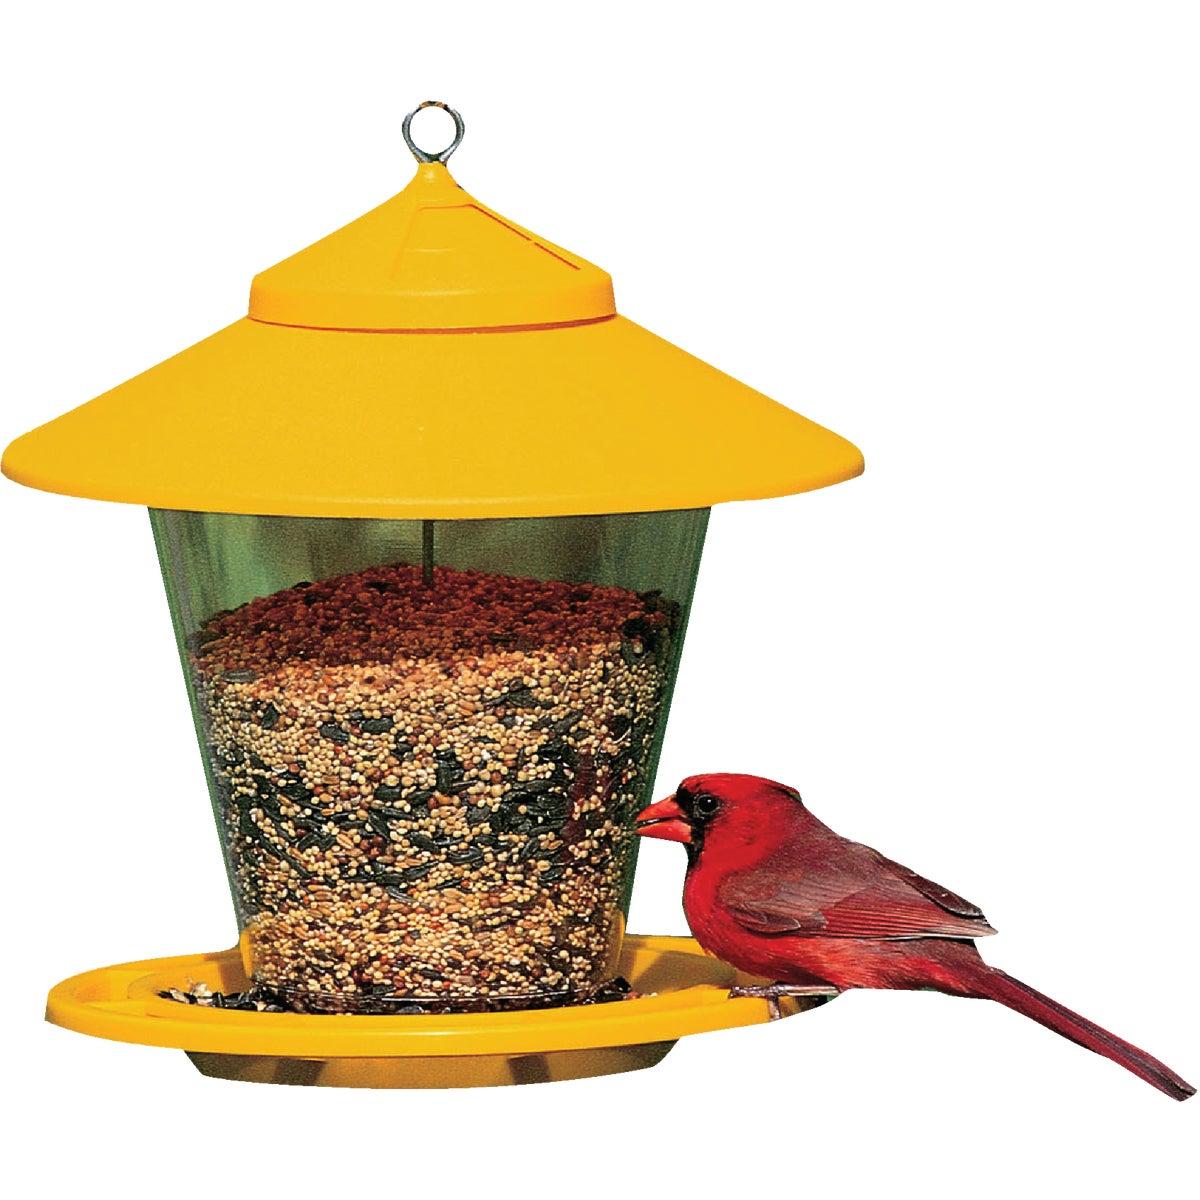 Kay Home Products GRANARY BIRD FEEDER 6231